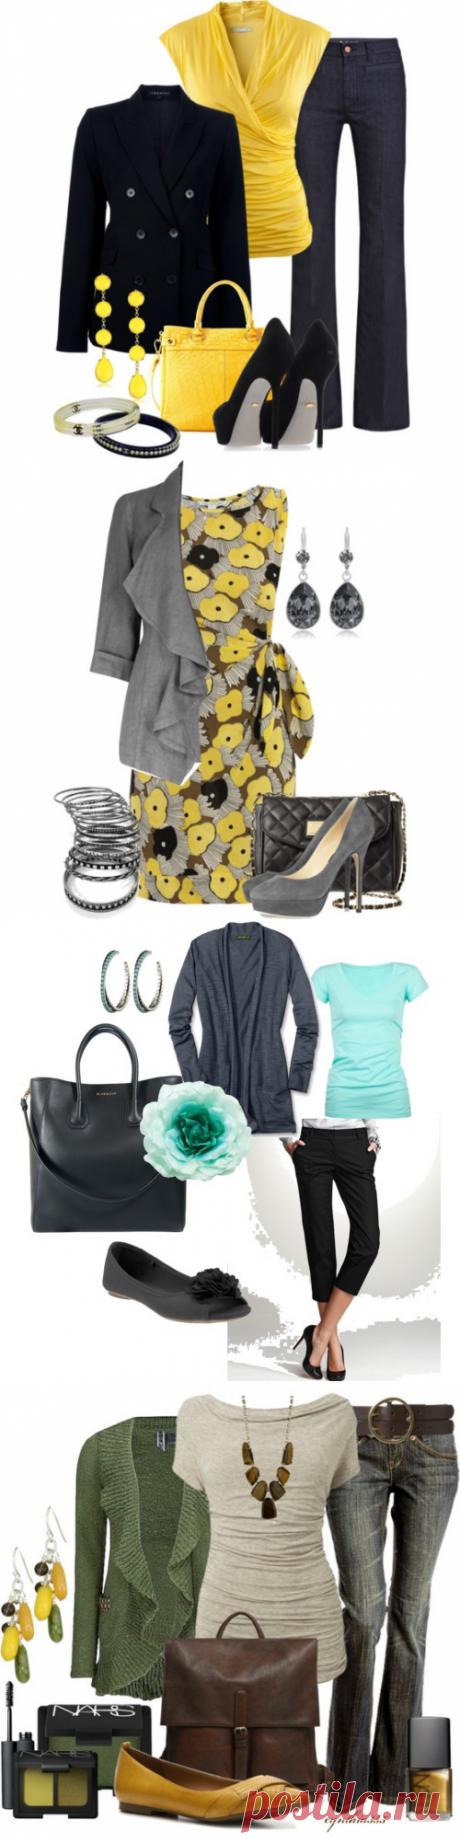 We put on stylishly - 10. Spring clothes